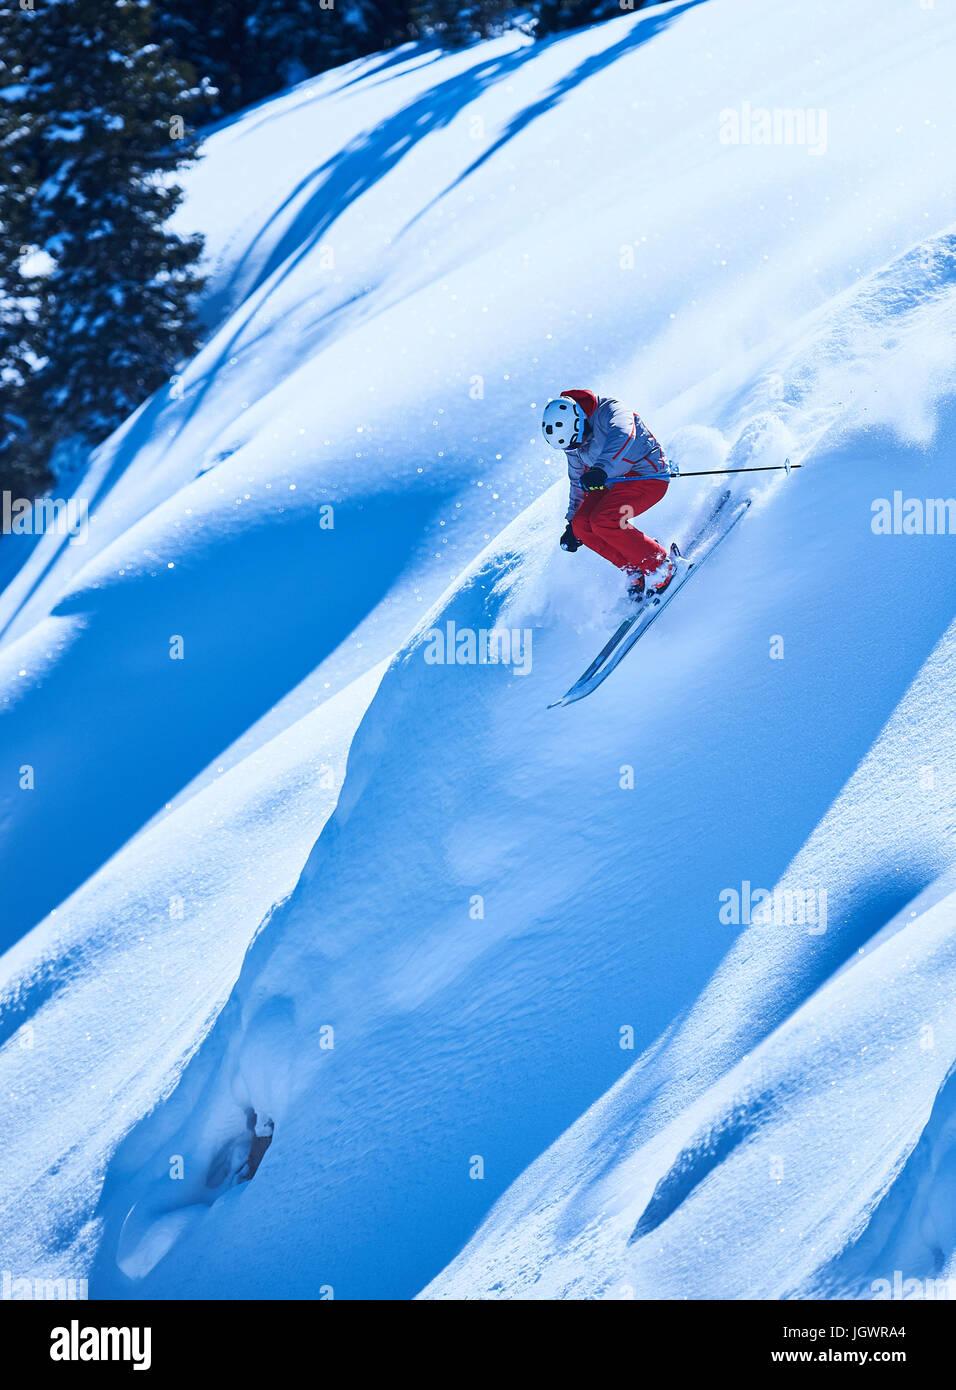 Man skiing down steep mountainside, Aspen, Colorado, USA - Stock Image